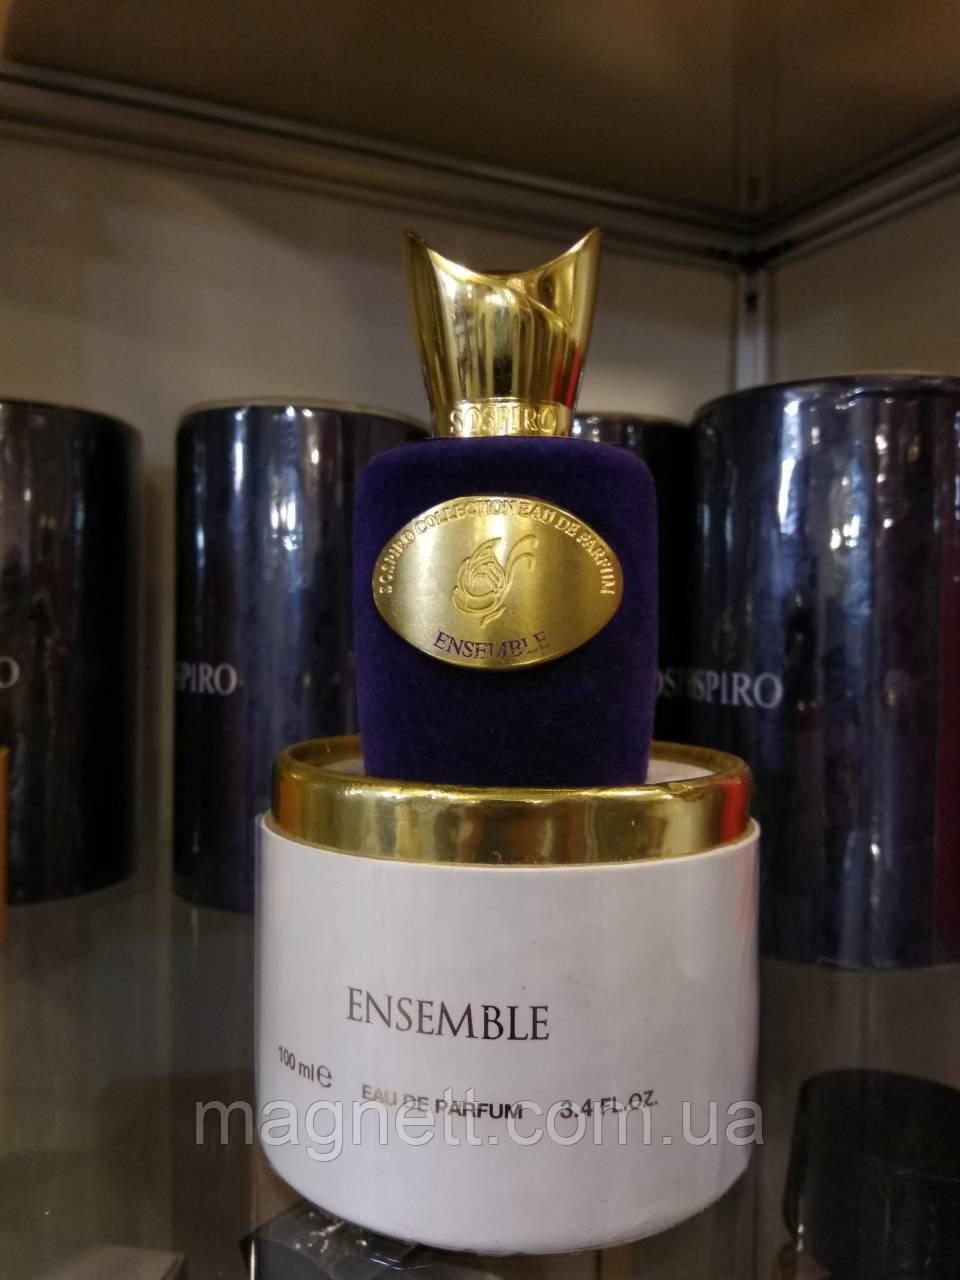 Sospiro Perfumes Ensemble тестер 100ml